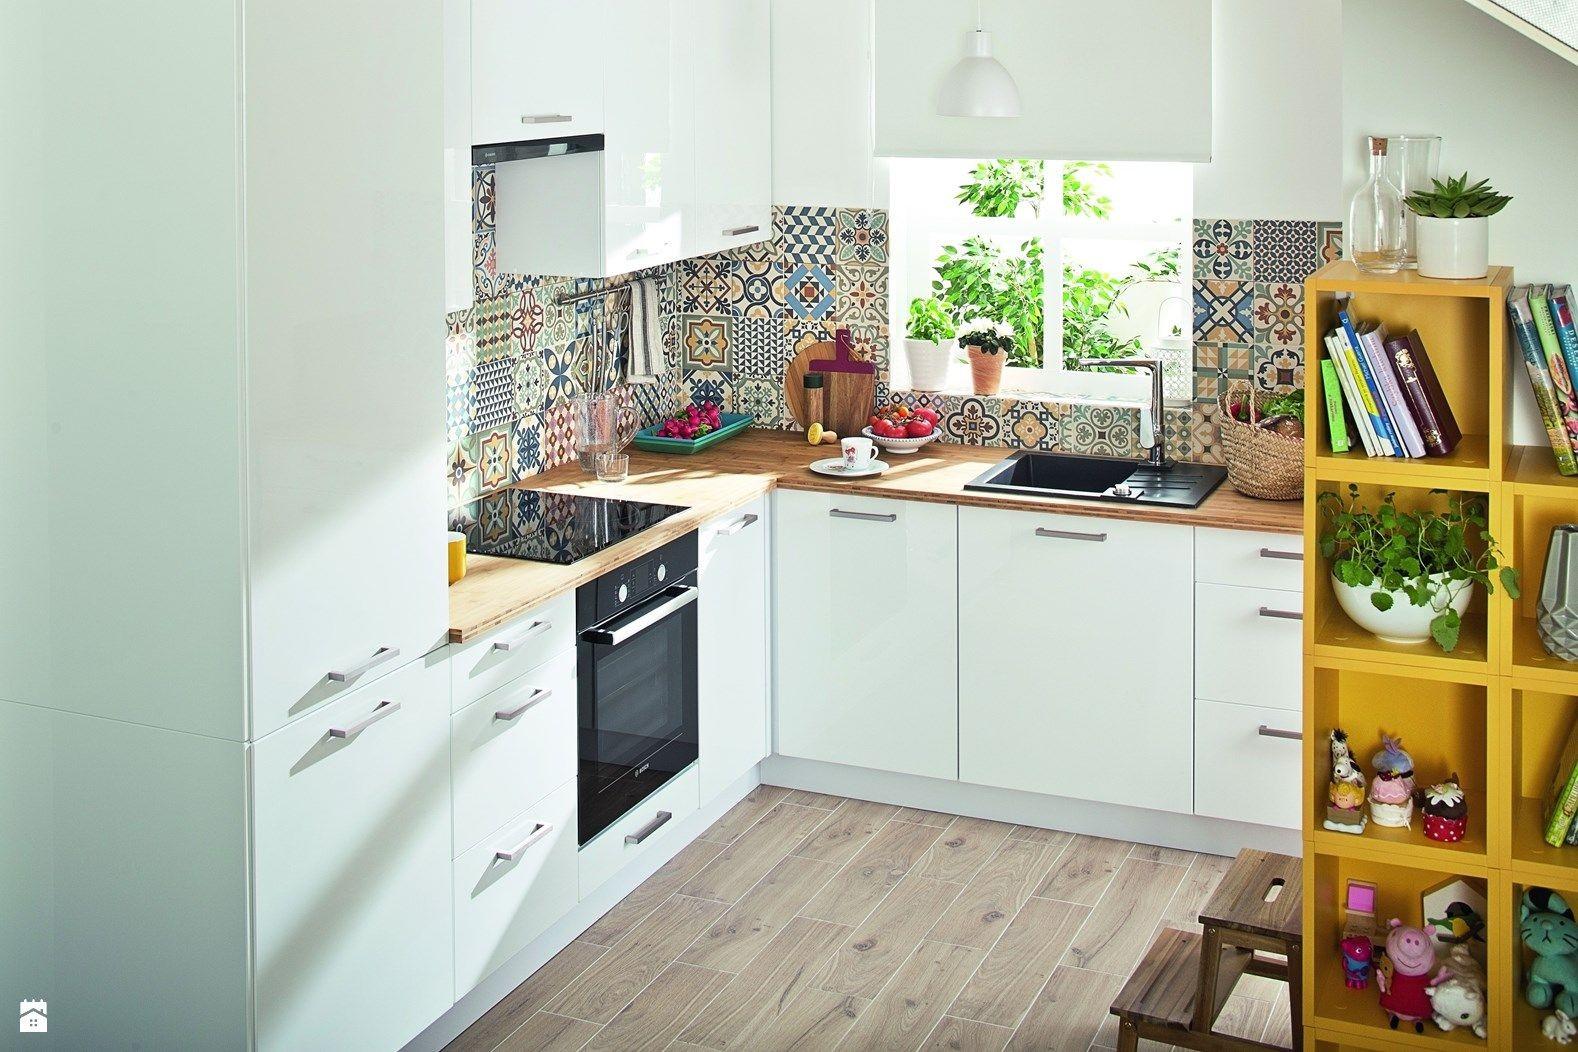 Castorama Plan De Travail Cuisine Impressionnant Photos Inspirant Plan De Travail Cuisine Castorama Vosenigmes